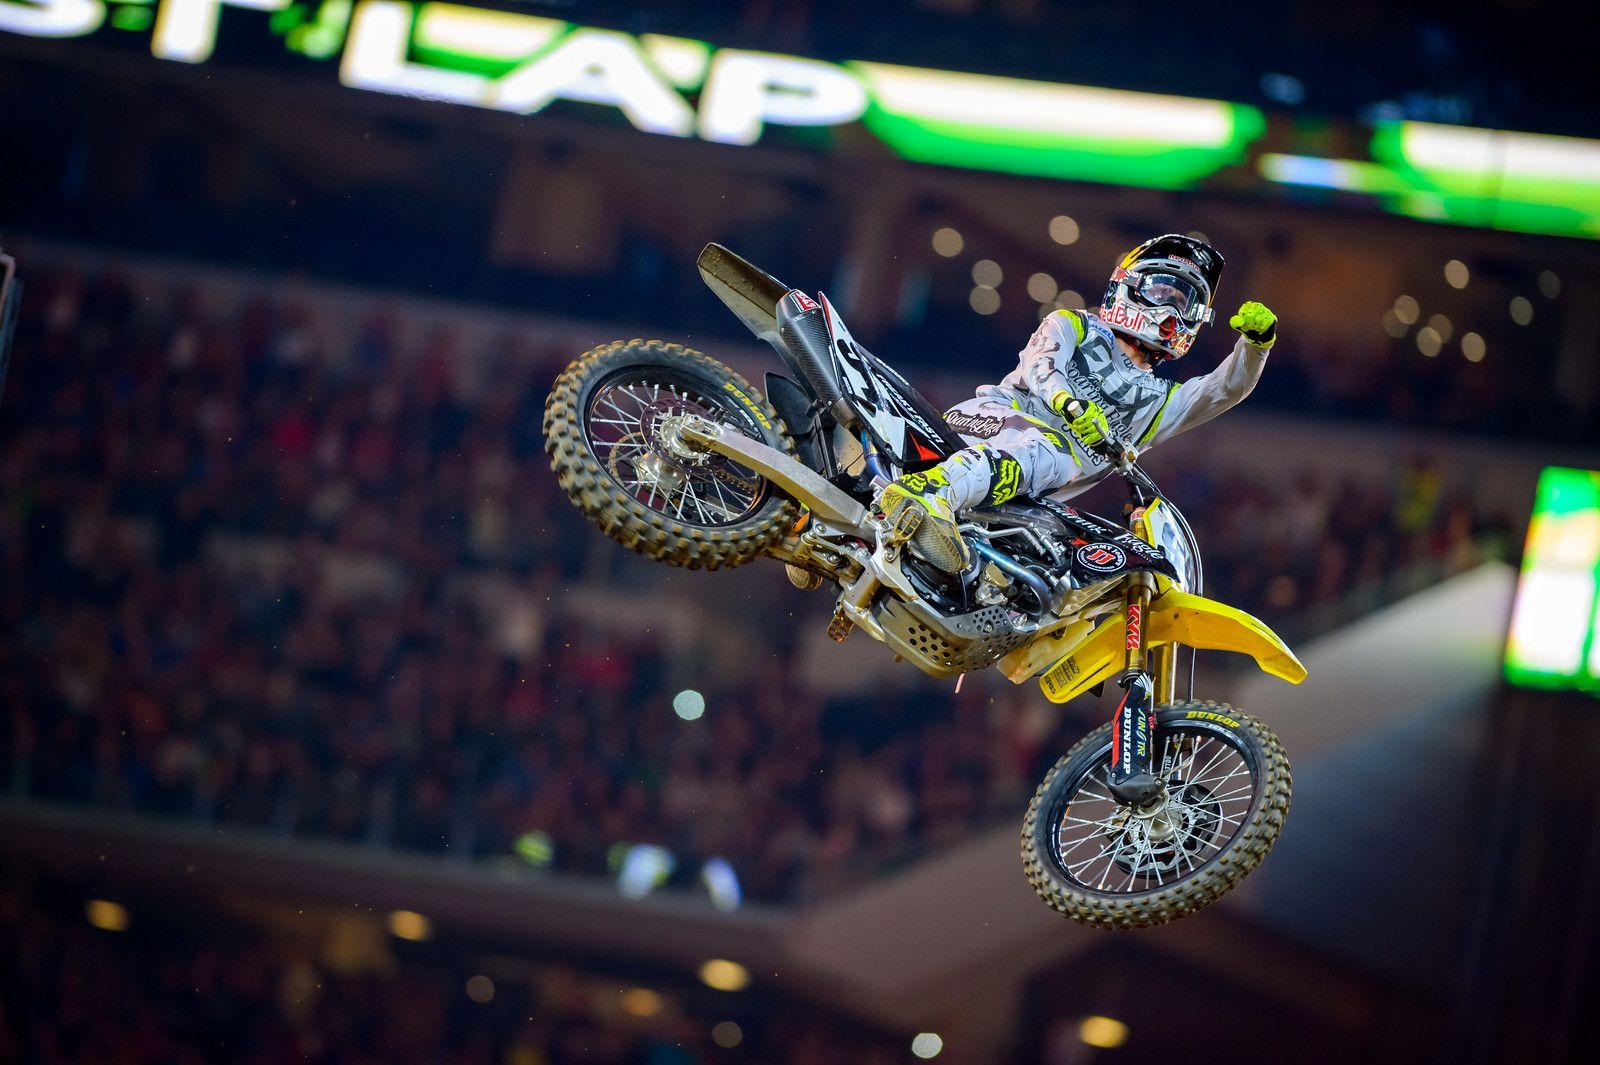 Ken Roczen Arlington Sx With Images Motosport Motocross